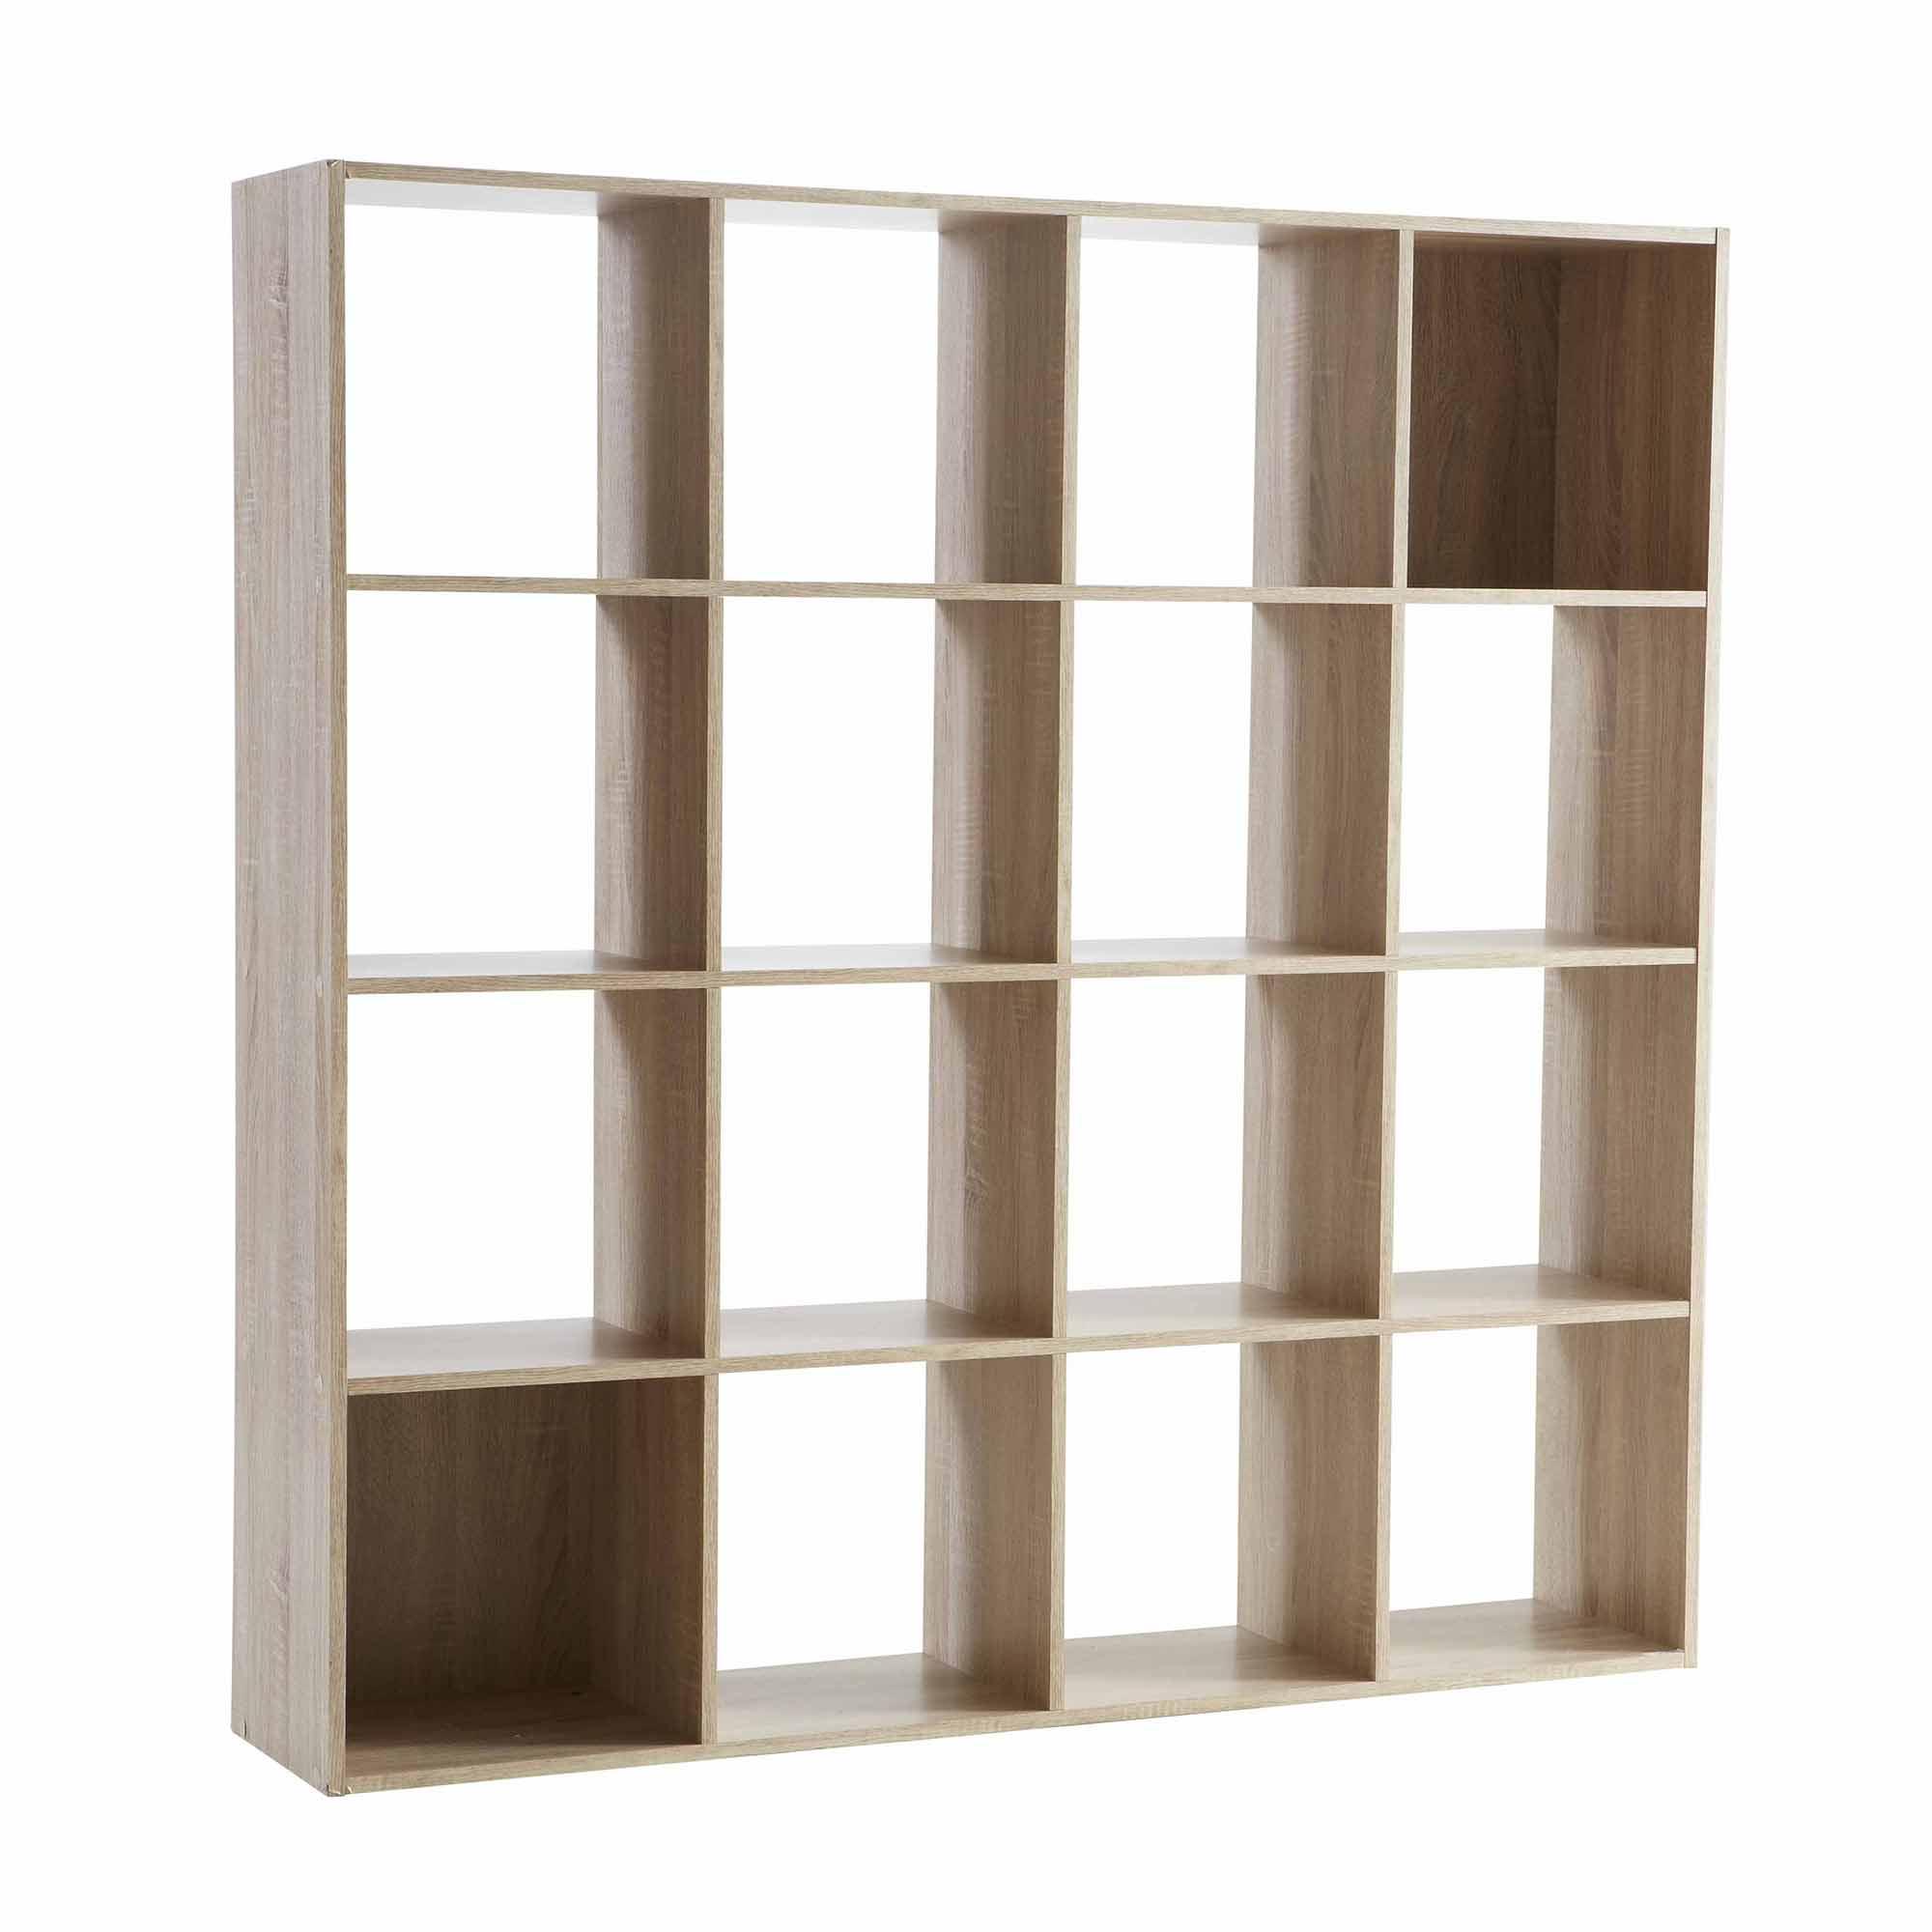 etag re biblioth que cosmos 16 cases en bois comparer. Black Bedroom Furniture Sets. Home Design Ideas